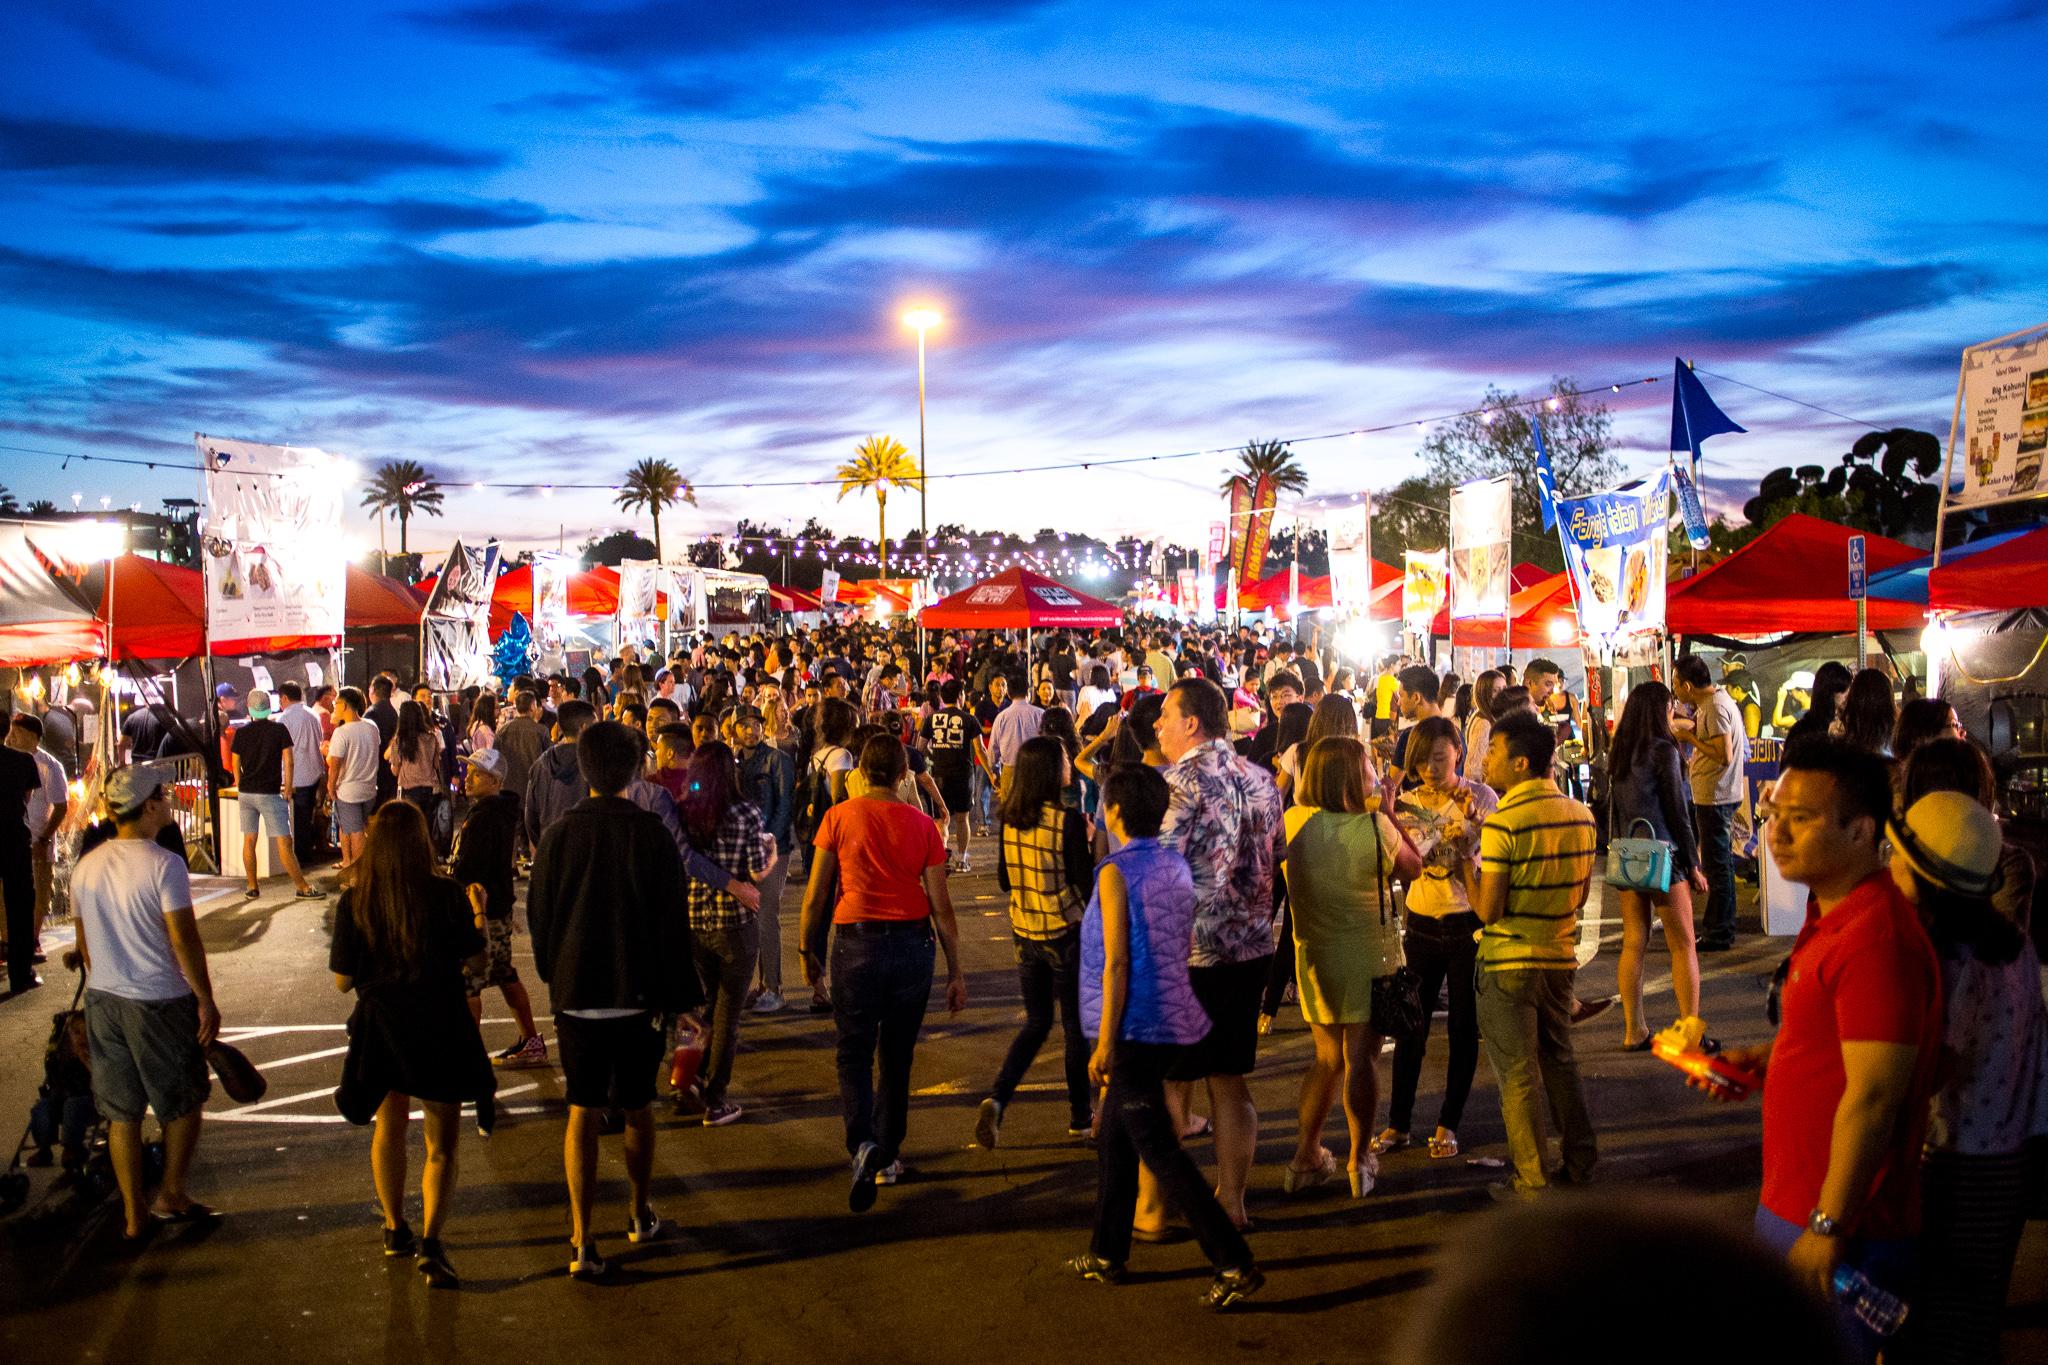 norcal-night-market-brian-fung.jpg